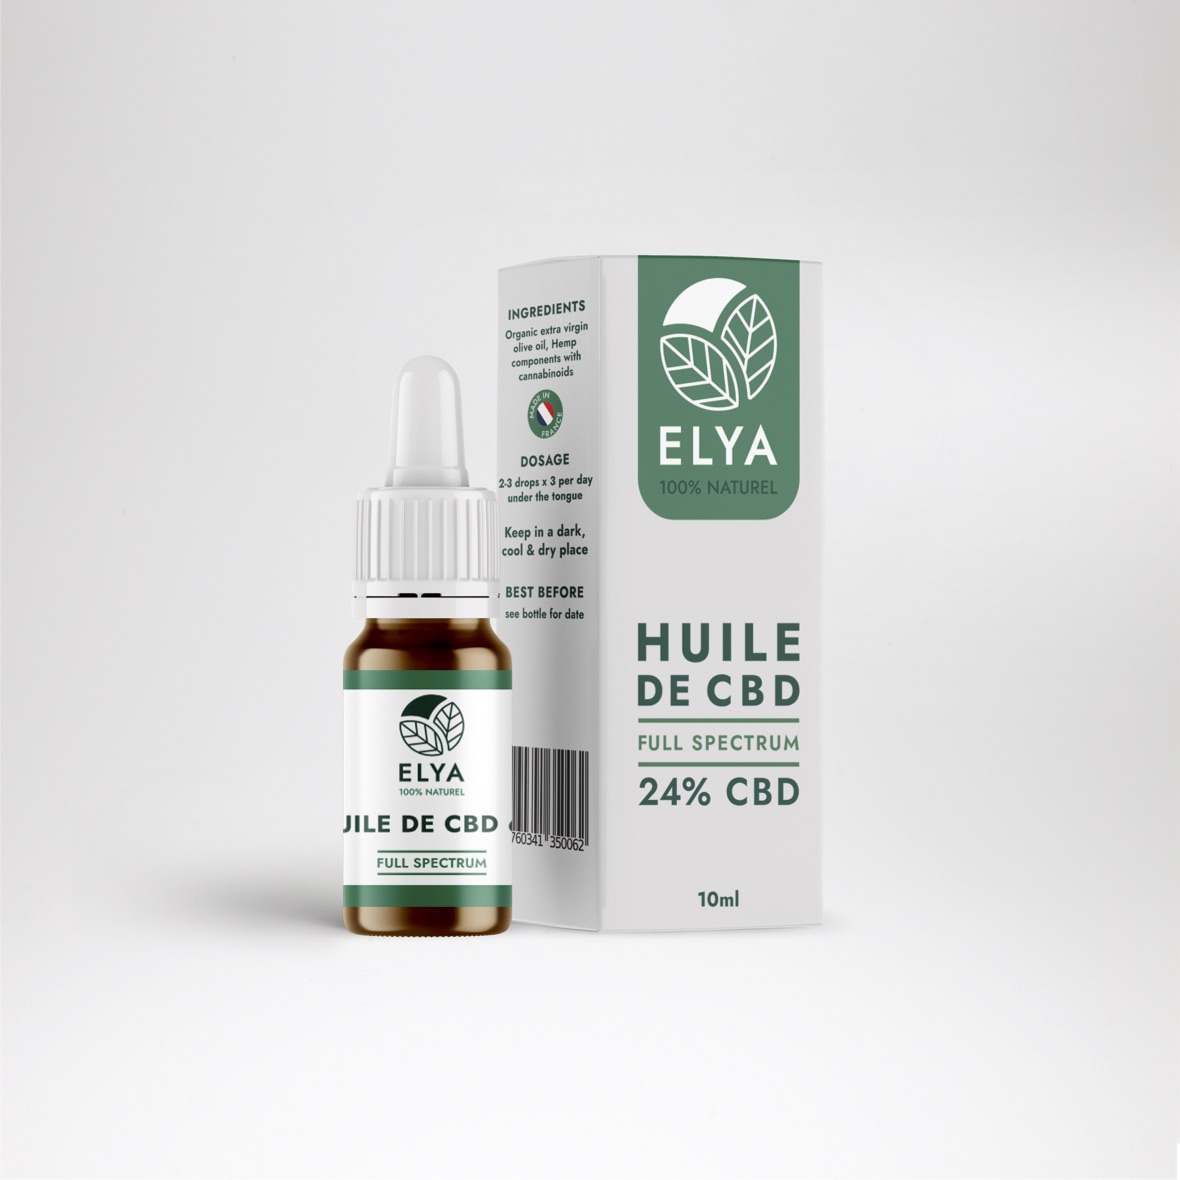 elya huile cbd bio france Full spectrum 24